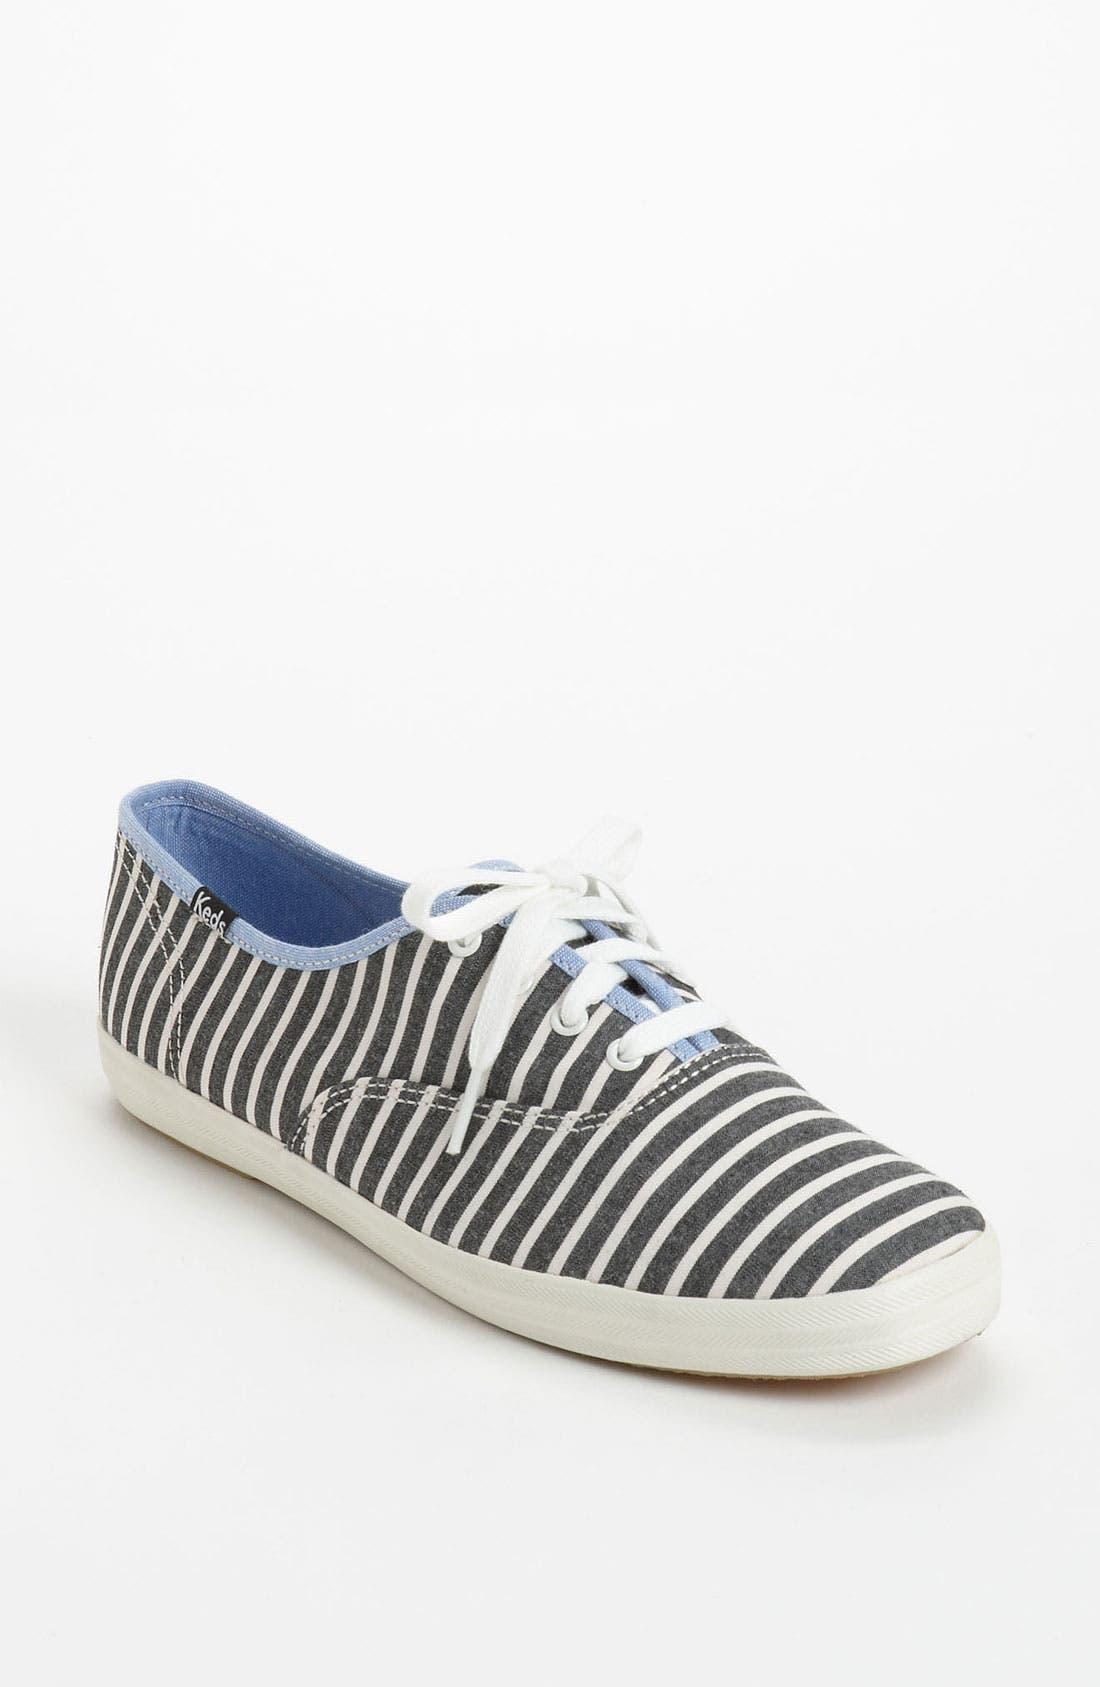 Alternate Image 1 Selected - Keds® 'Champion Prep Stripe' Sneaker (Women)